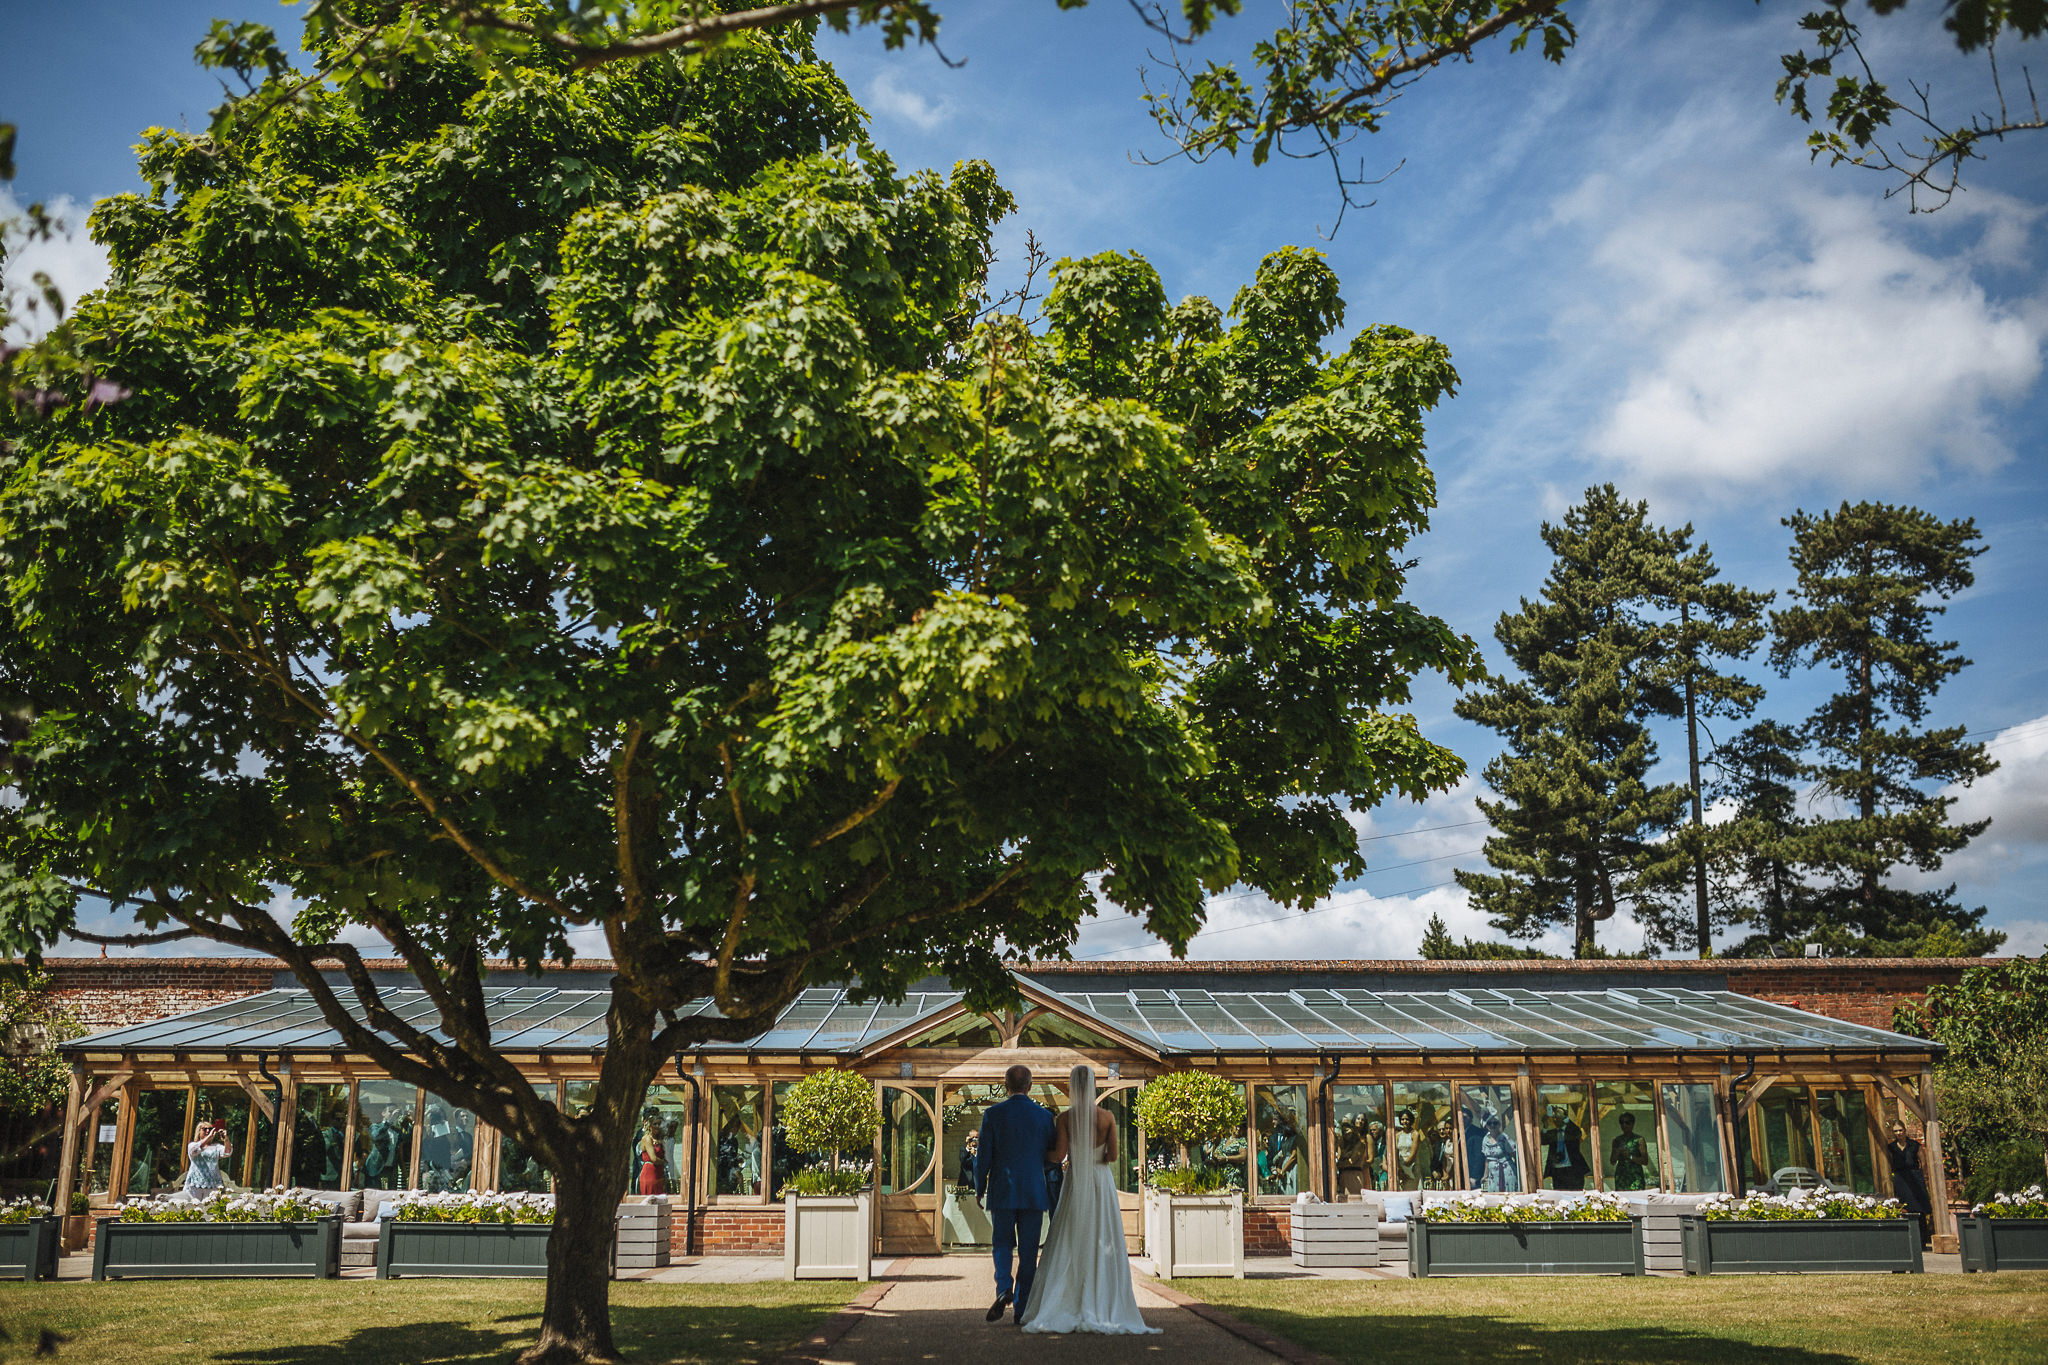 paul-marbrook-Gaynes-Park Wedding-Photographer-90044